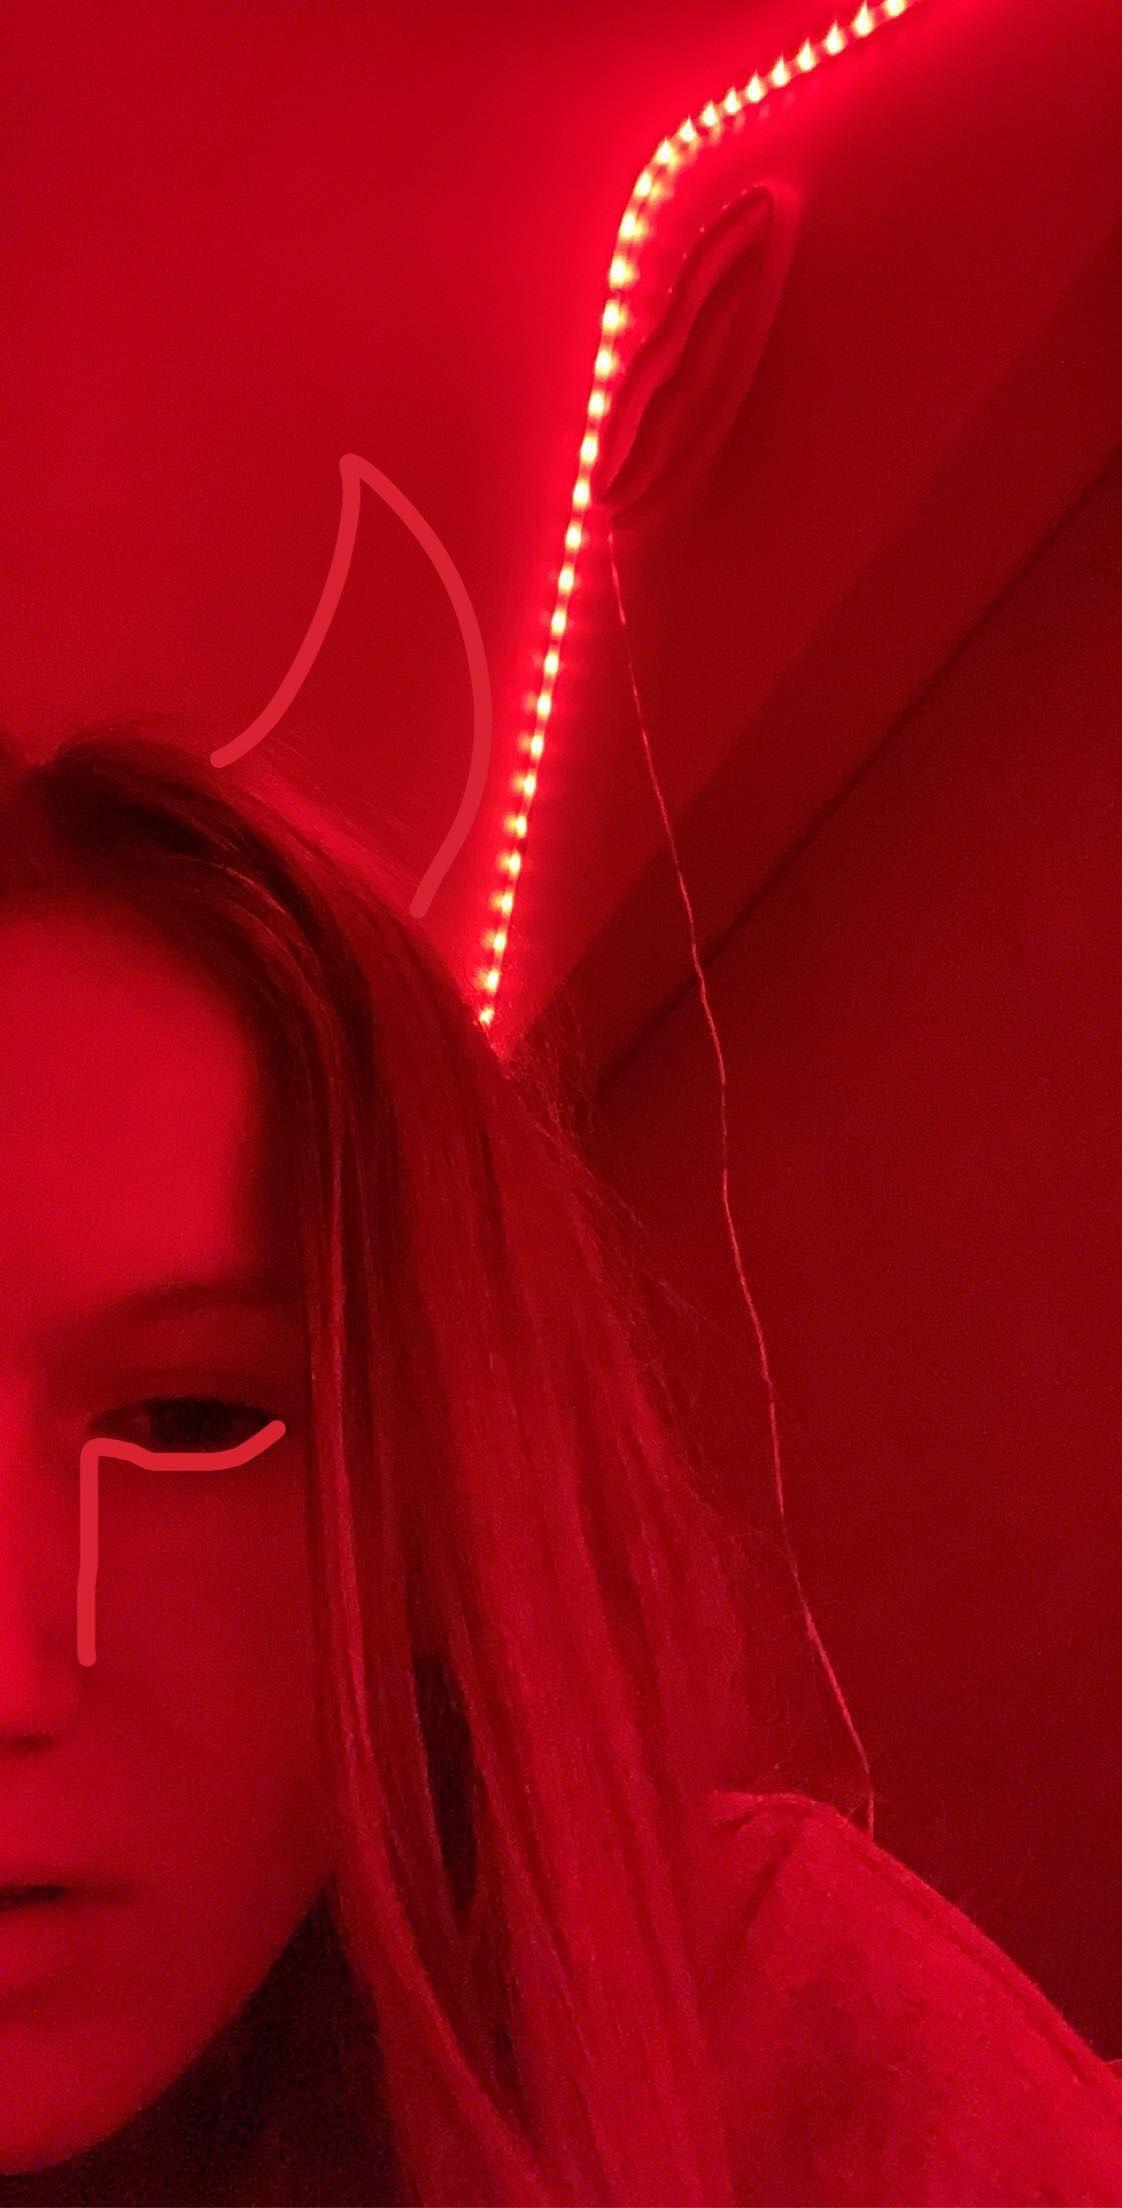 Pin on redd grunge